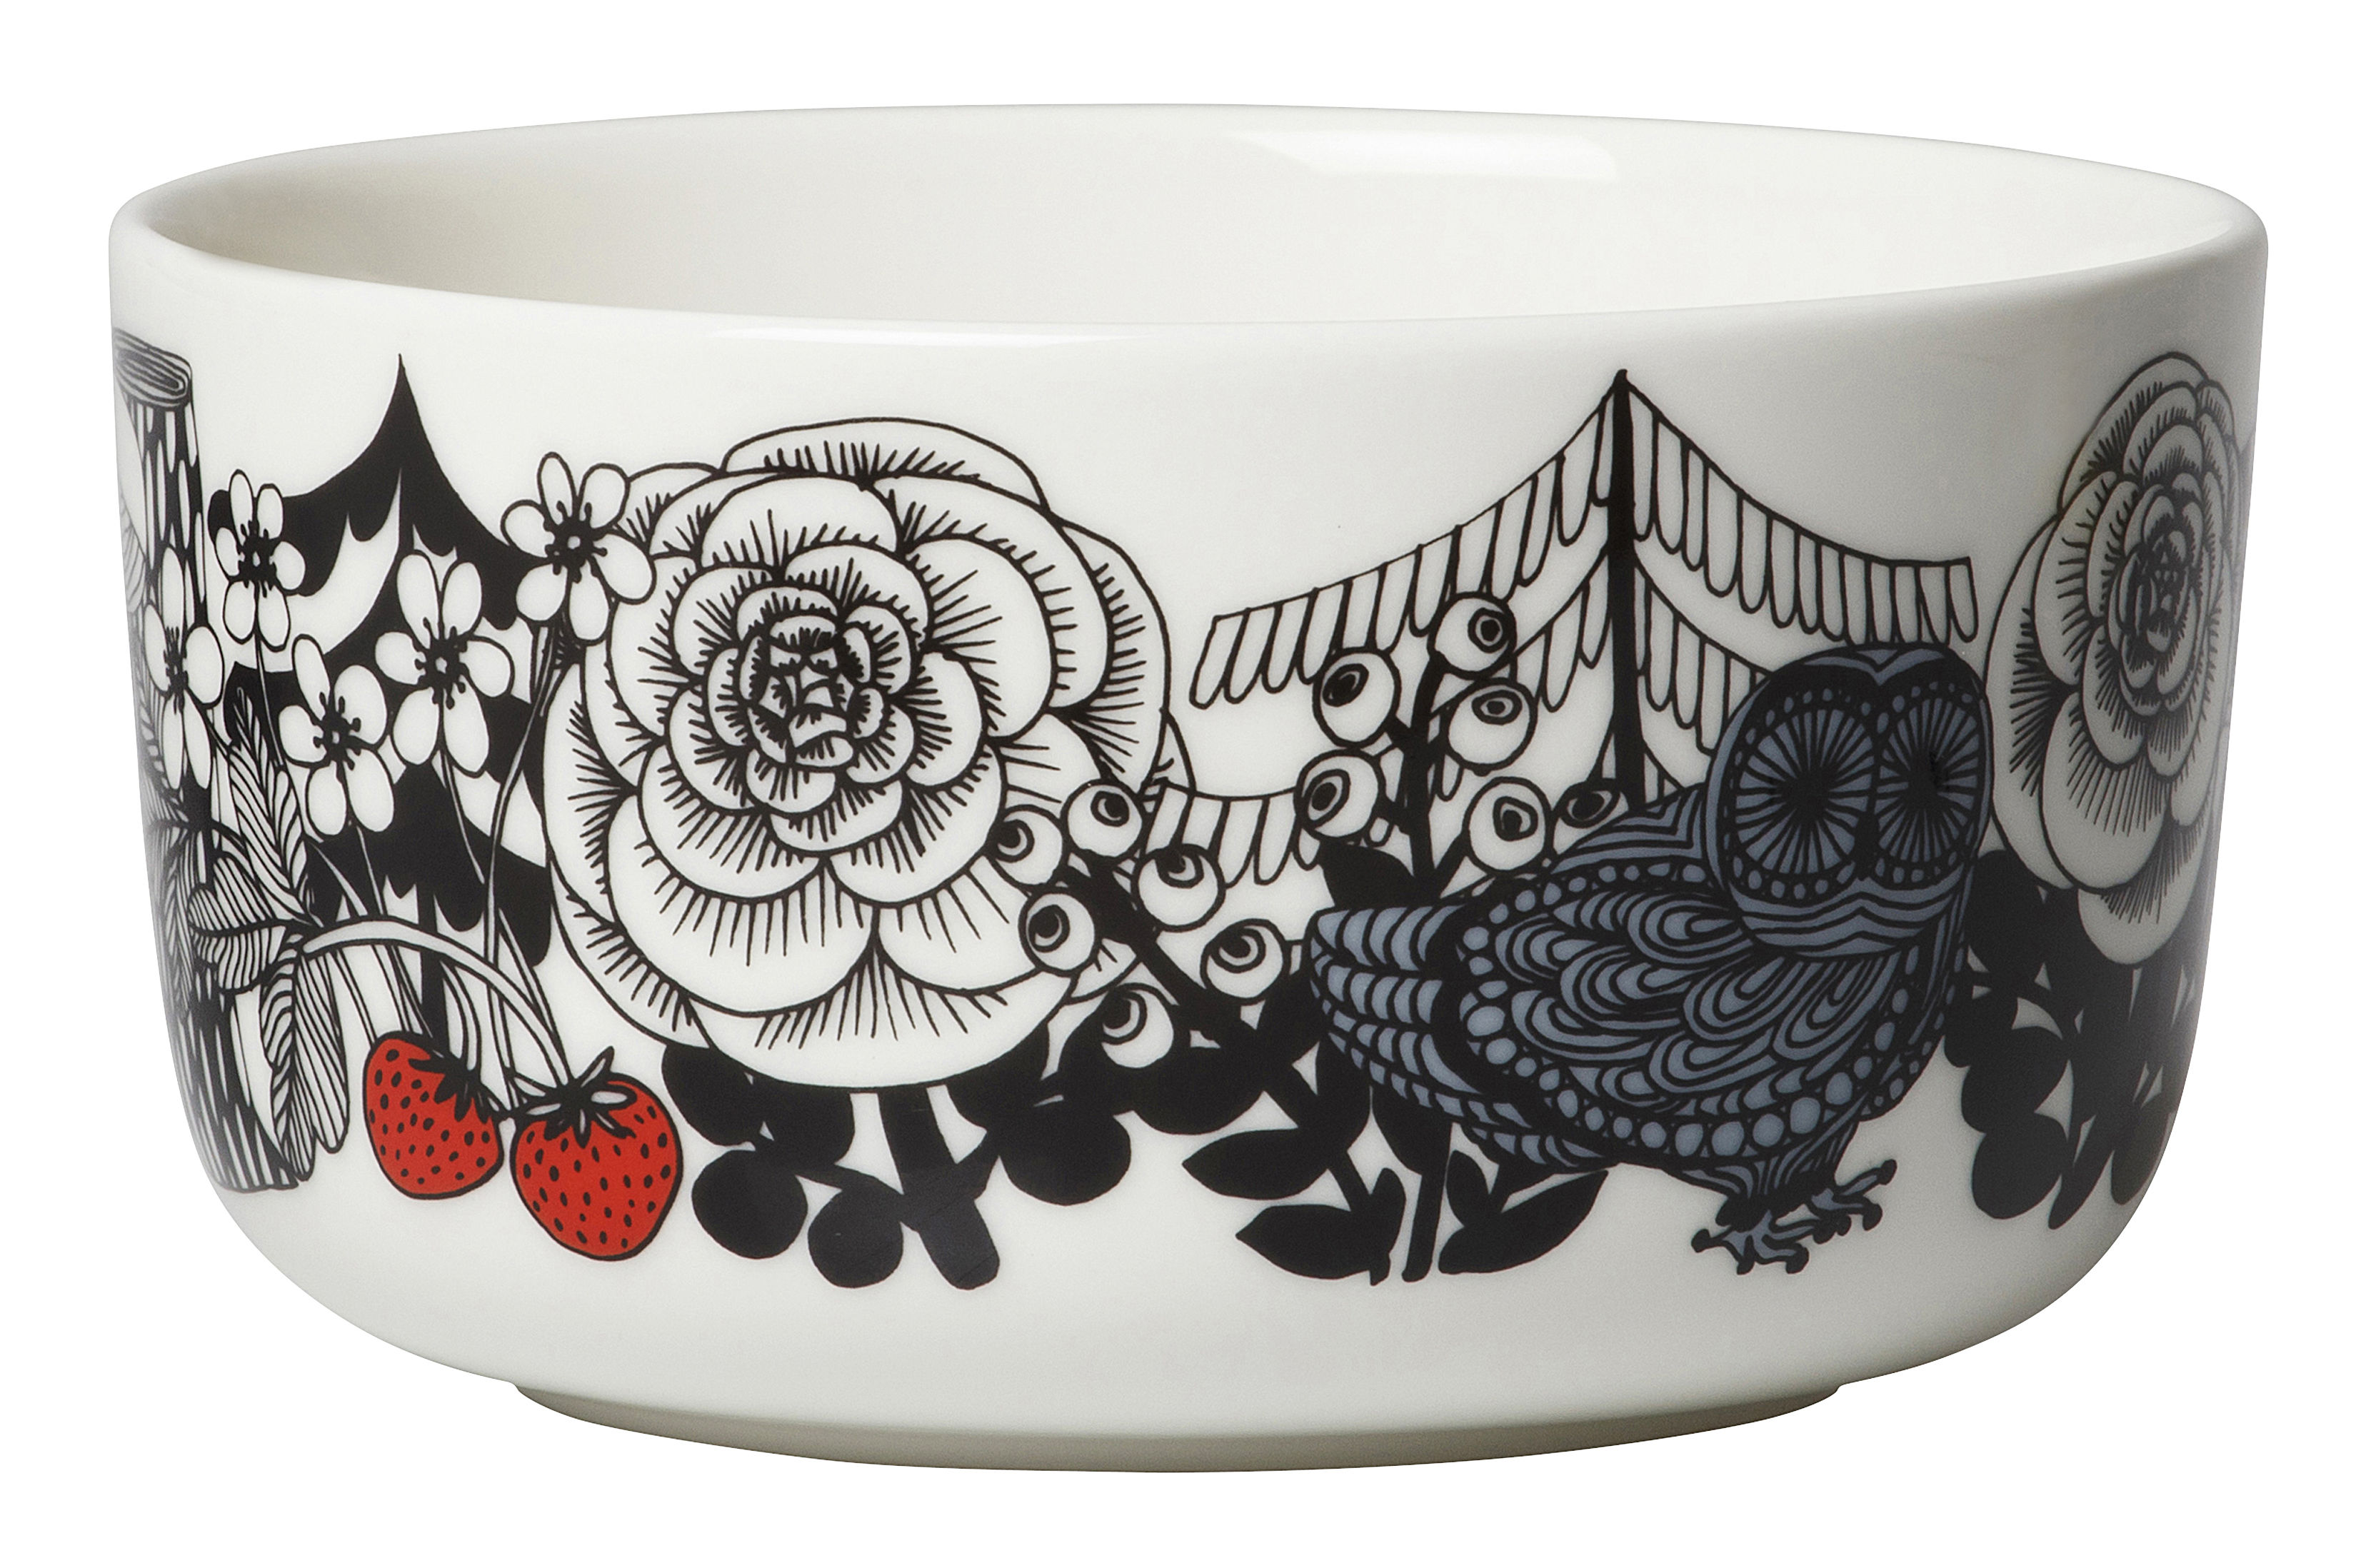 Tableware - Bowls - Veljekset Bowl - Ø 12,5 cm by Marimekko - Veljekset / White, Black & Red - Sandstone